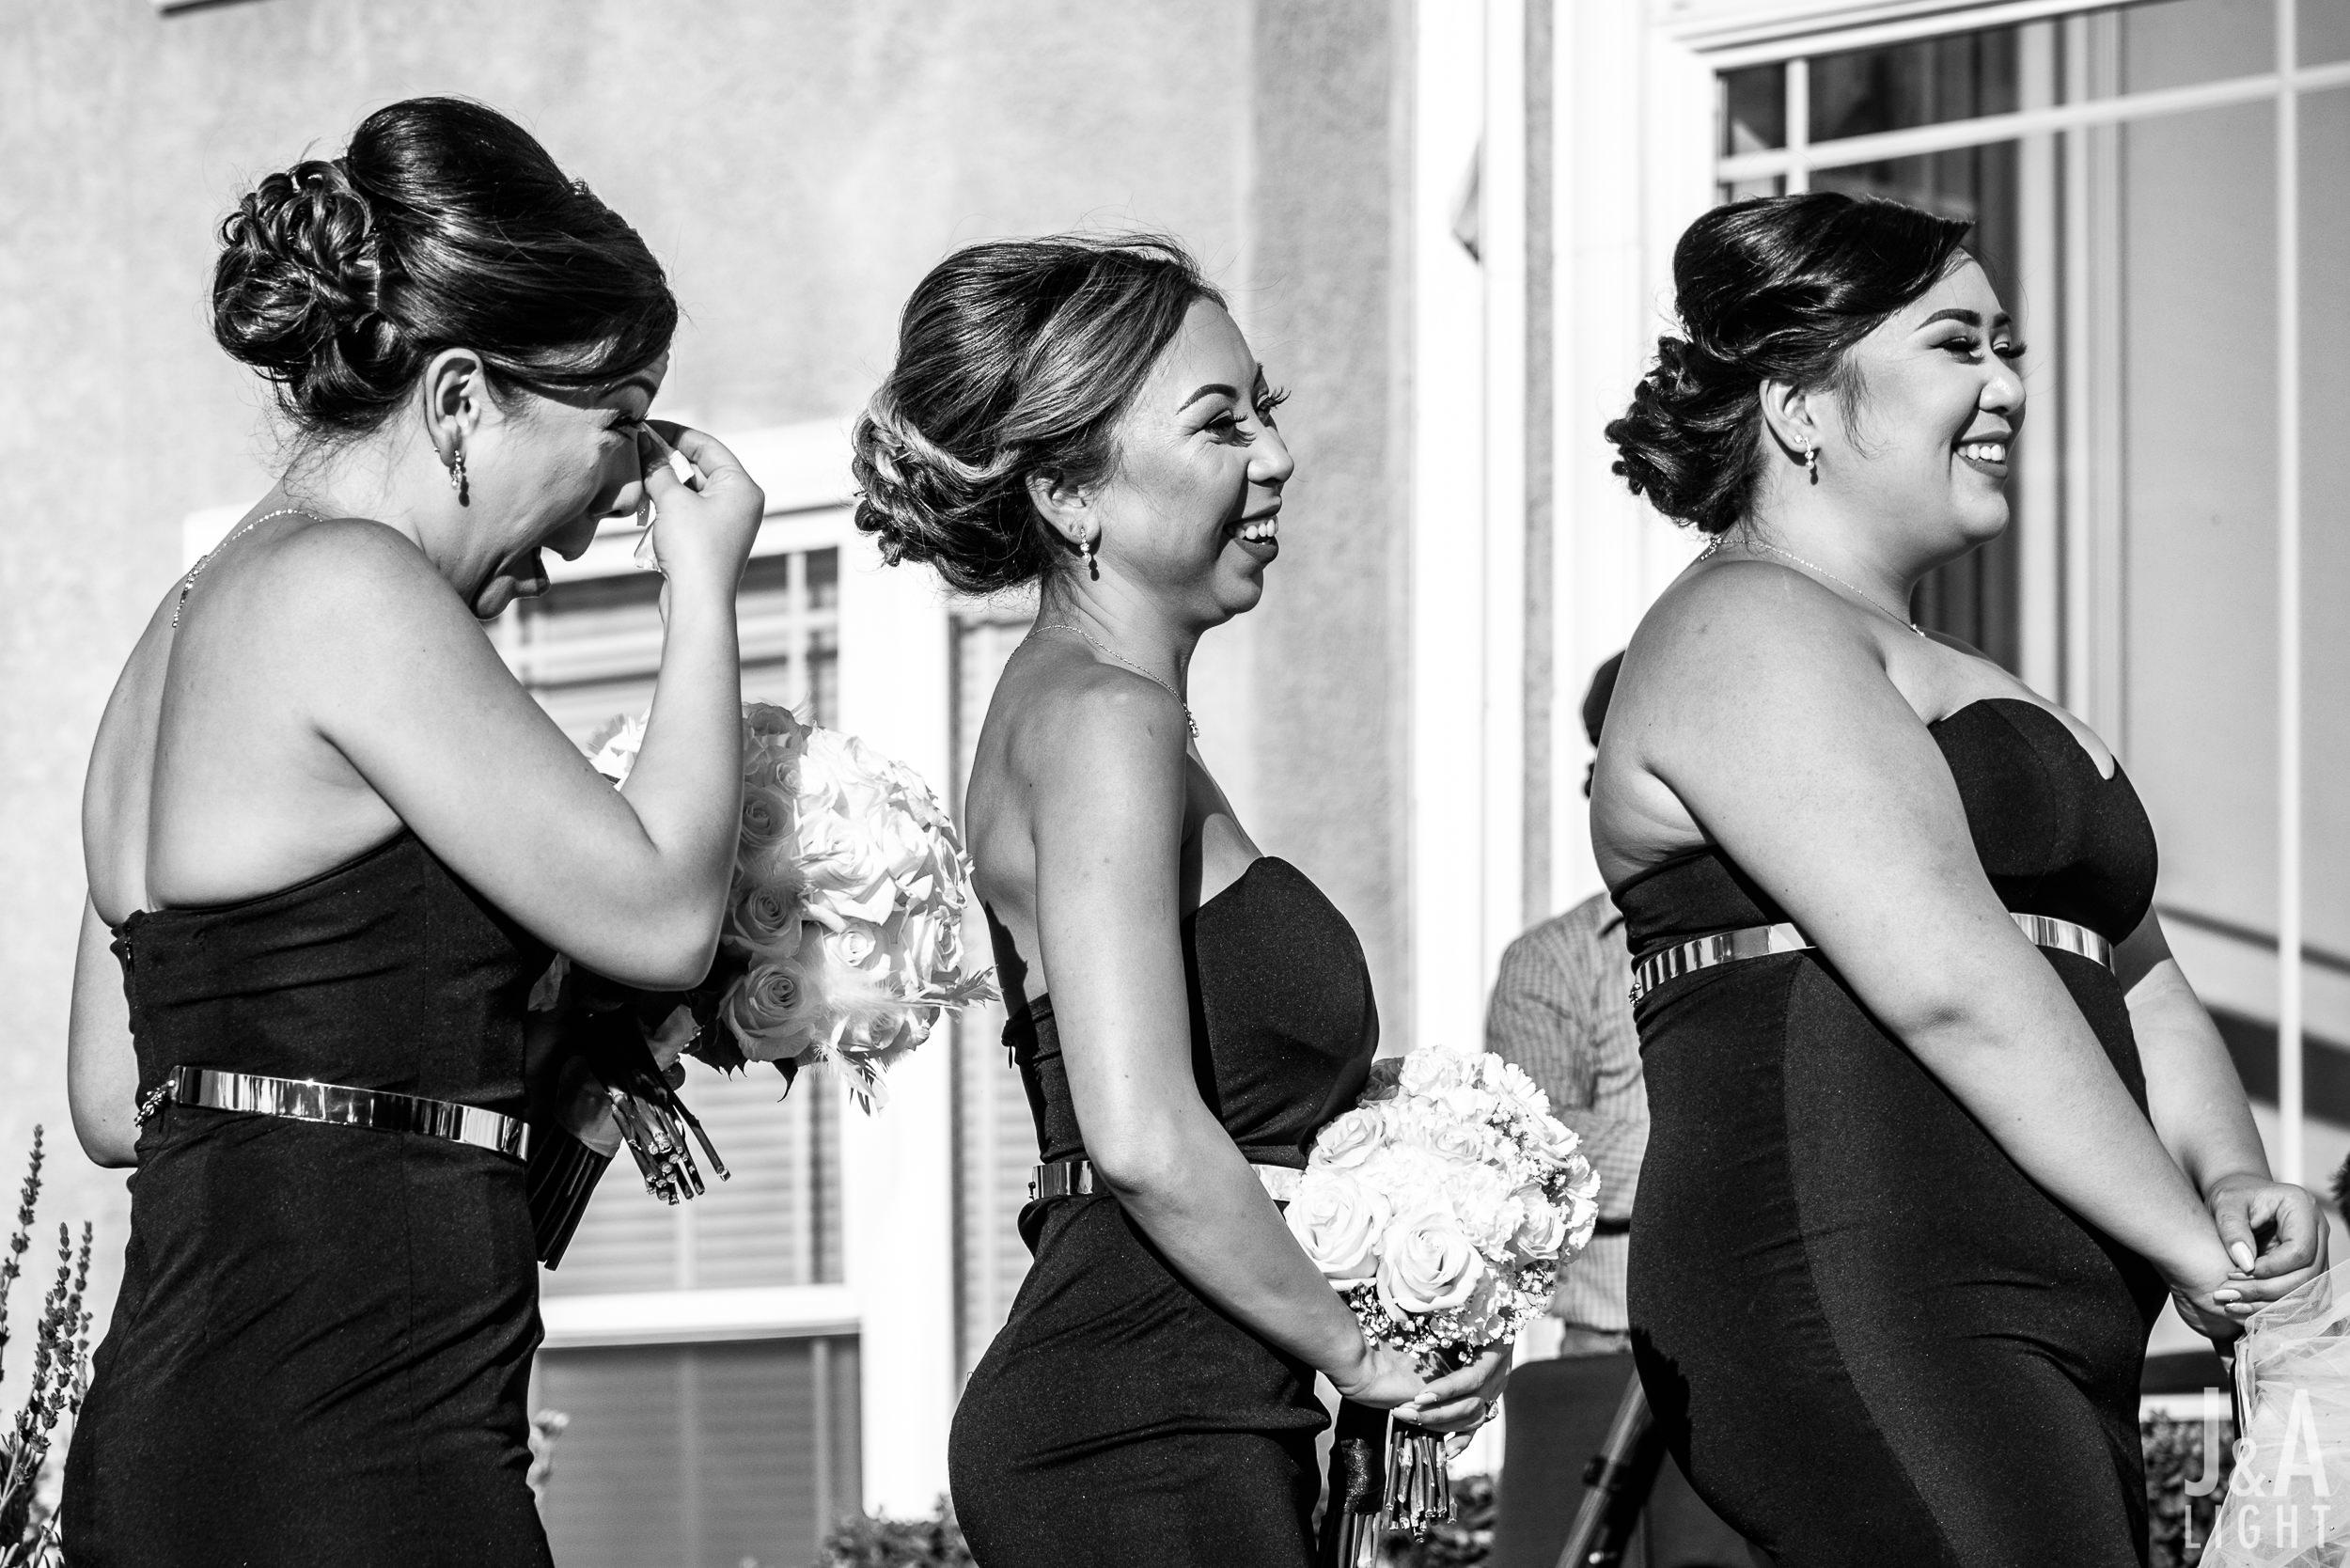 20171014-JanDan-LosBanos-GlassMansion-Wedding-Blog-039.jpg